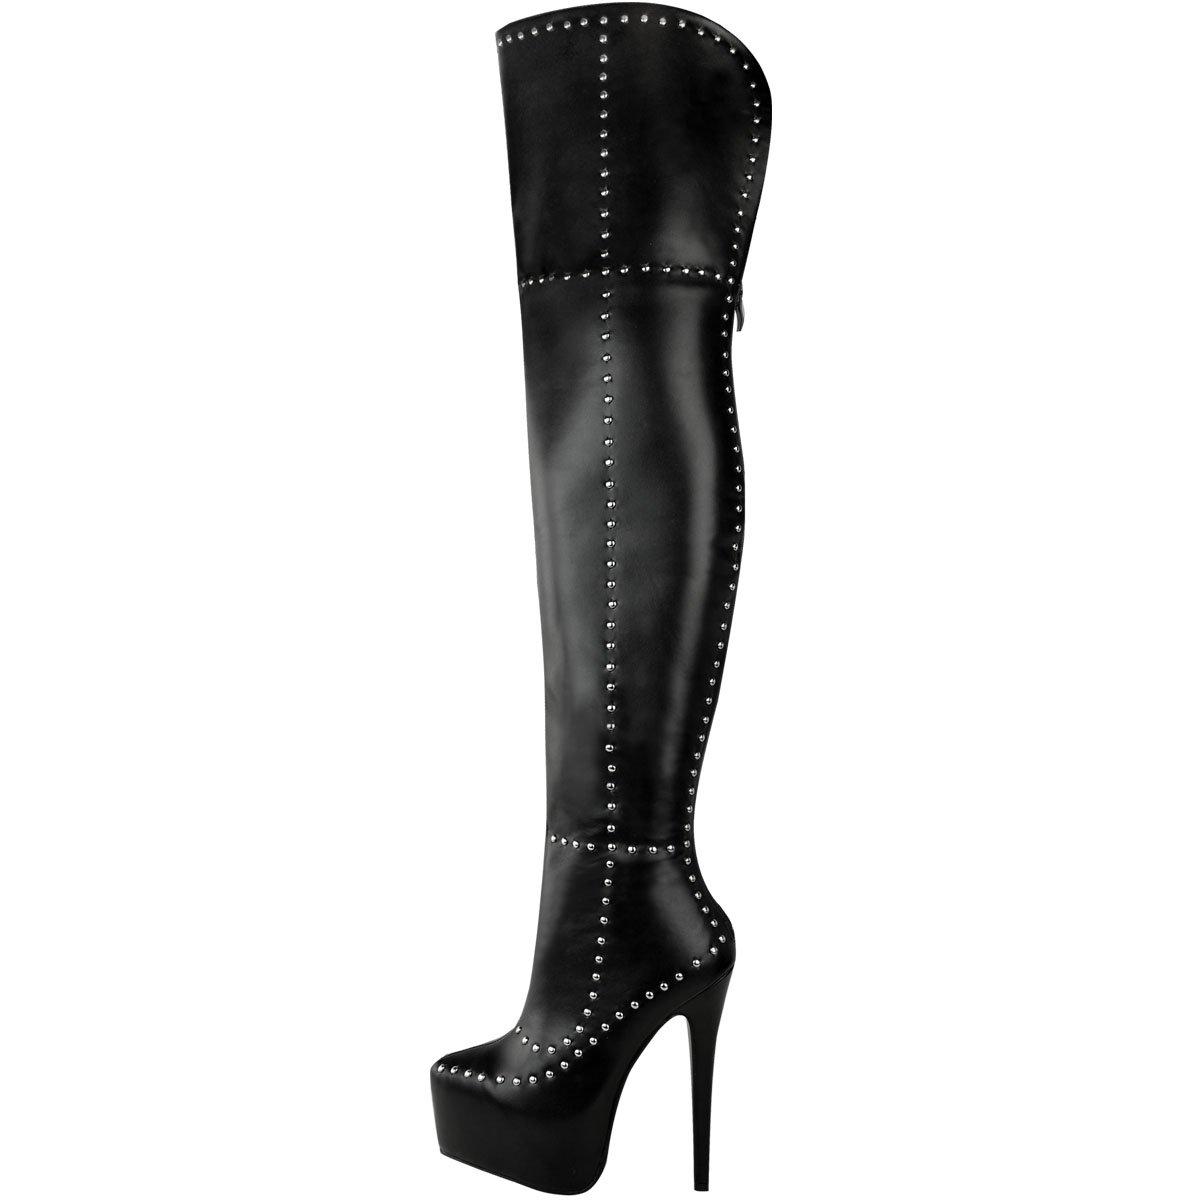 Fashion Thirsty Womens Studded Platform Sexy Thigh High Boots Stiletto Punk Goth Size B076ZKZ7C1 9 B(M) US|Black Faux Leather